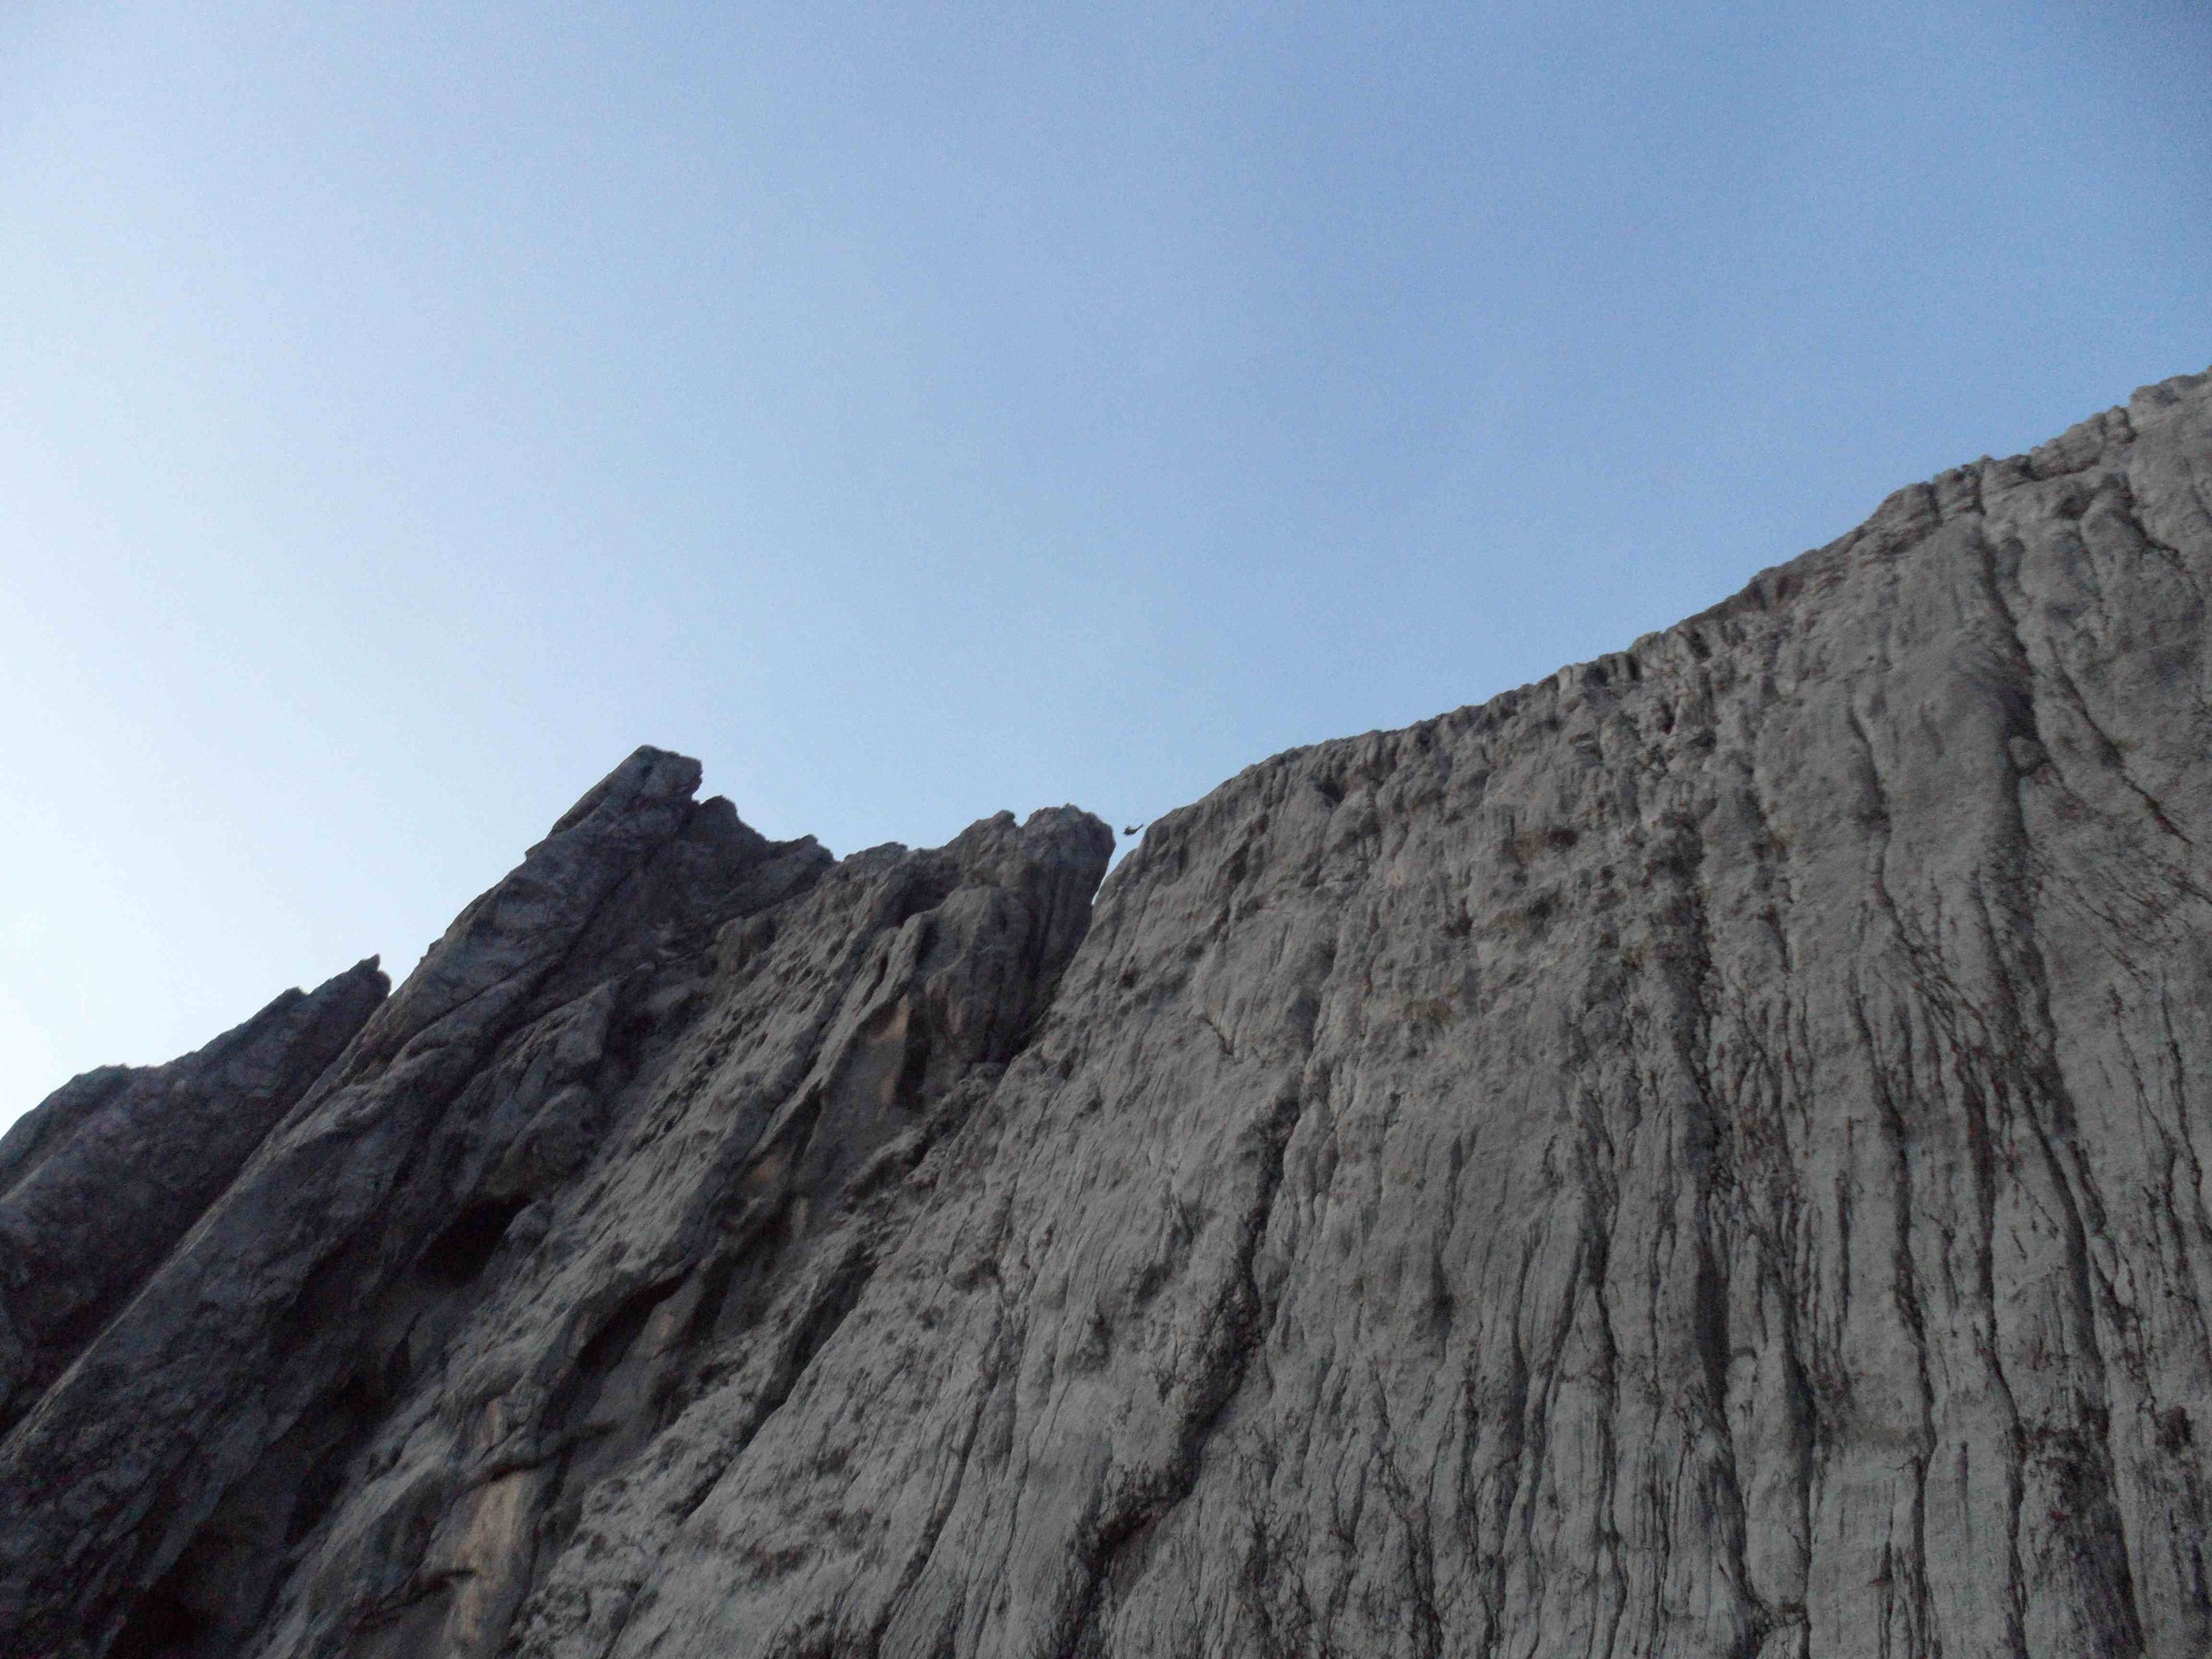 A sagilardan sirttaki acikliga ve tirol gecisine bakis / A look at the gap on the ridge and the tyrollean crossing from below